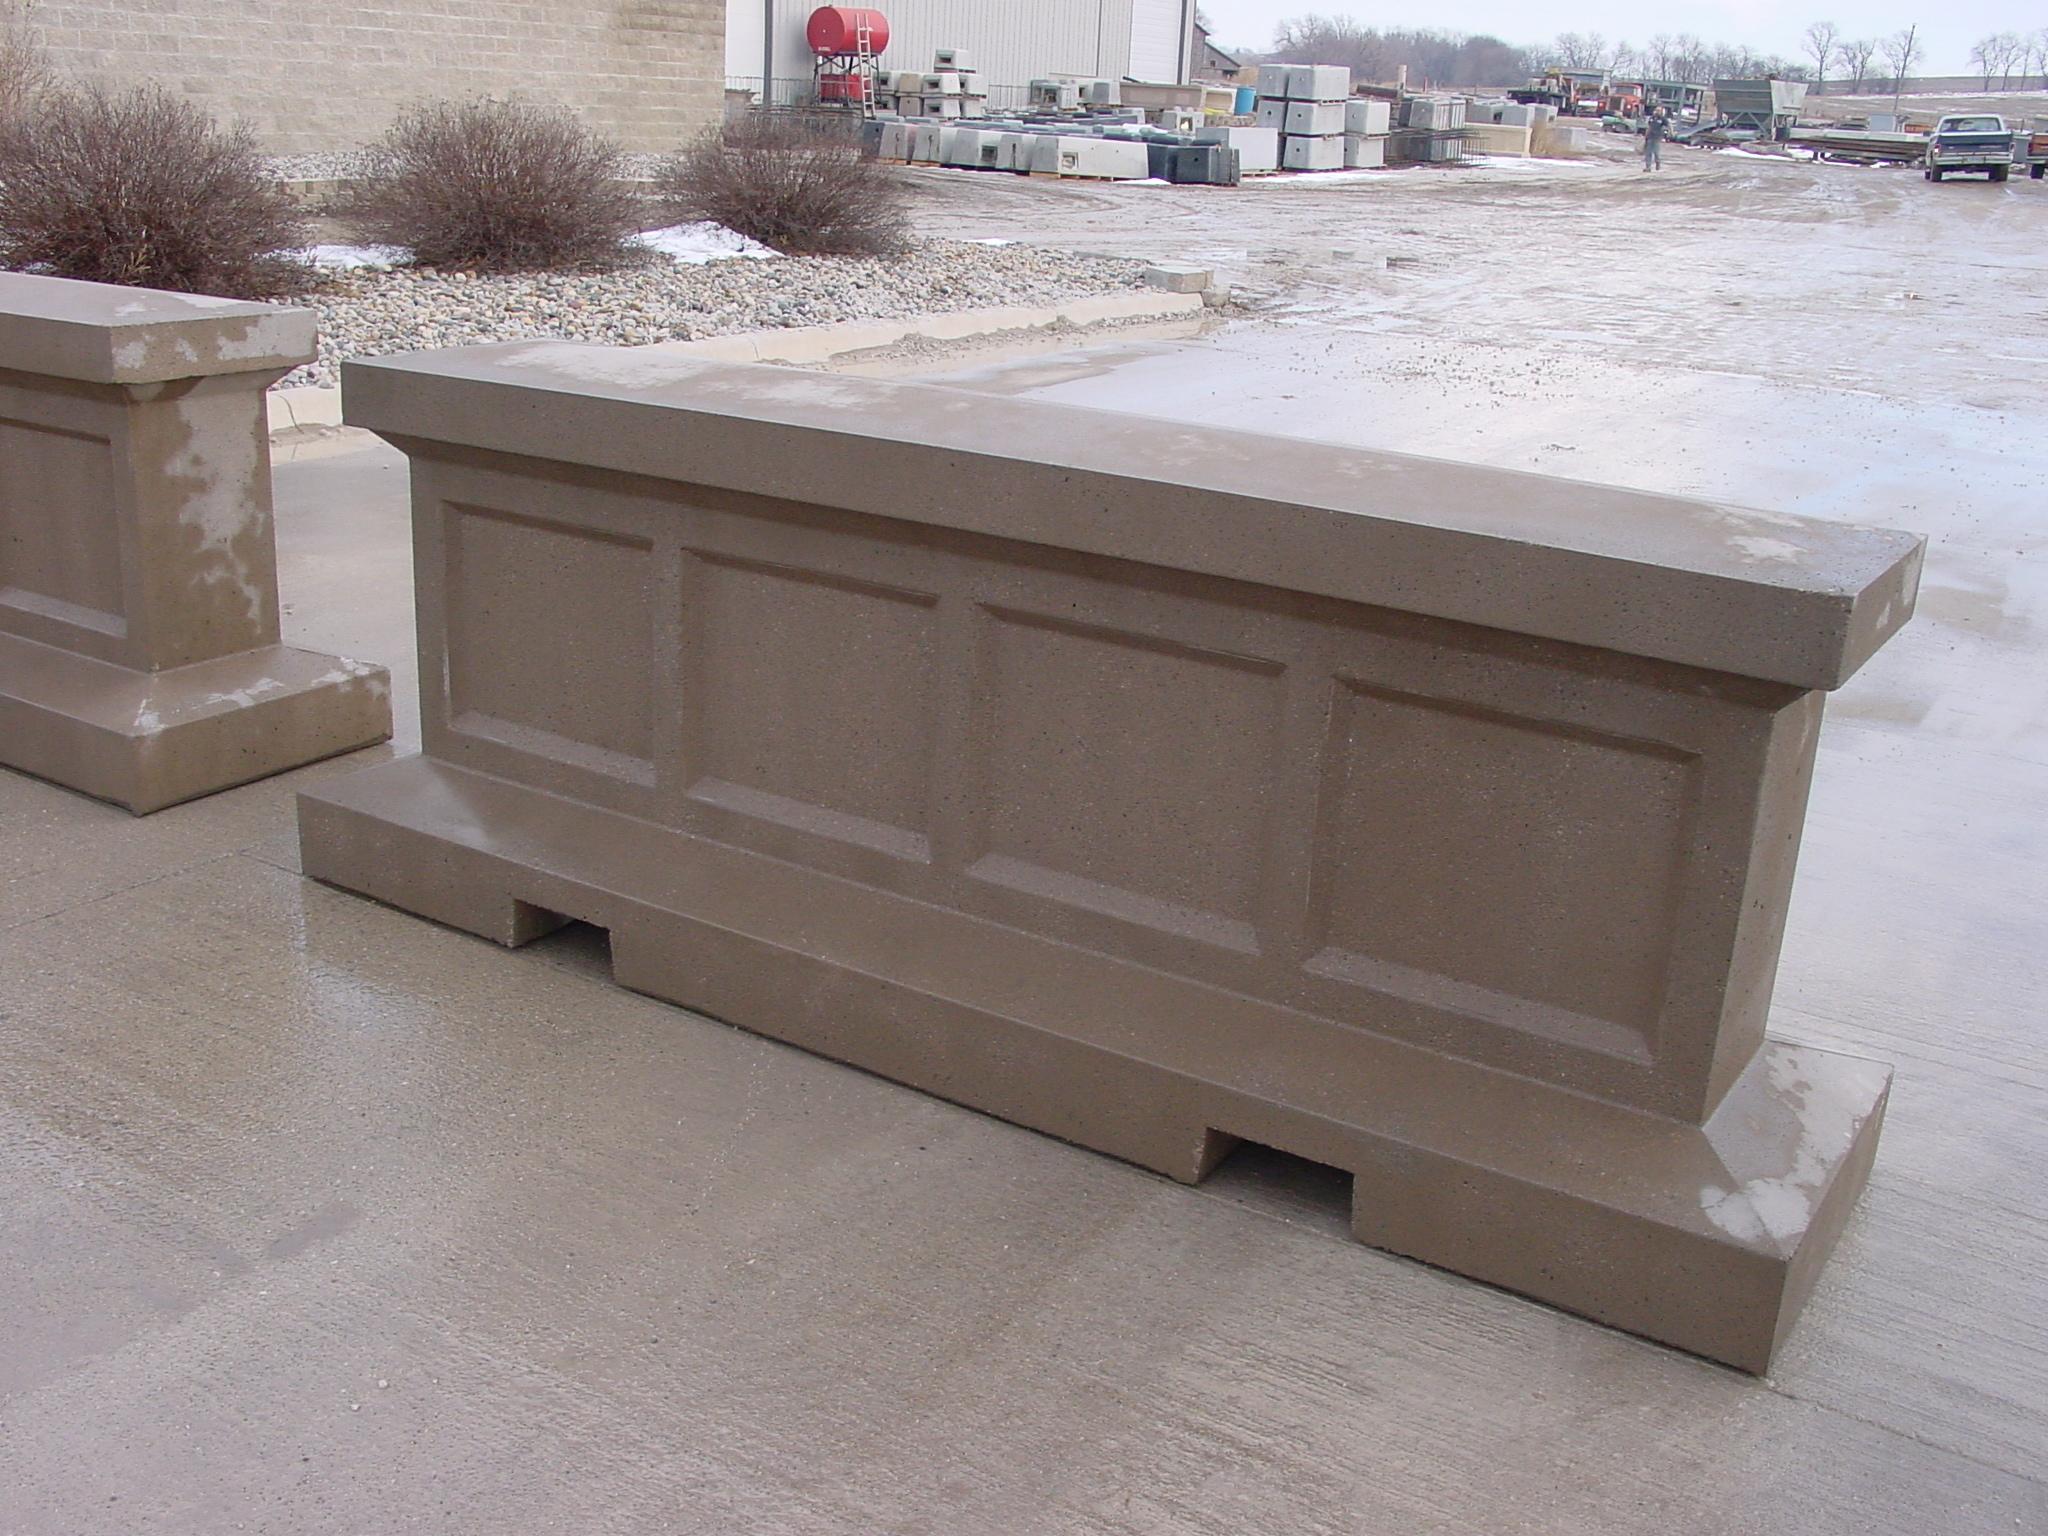 Decorative Barrier (Petersen)